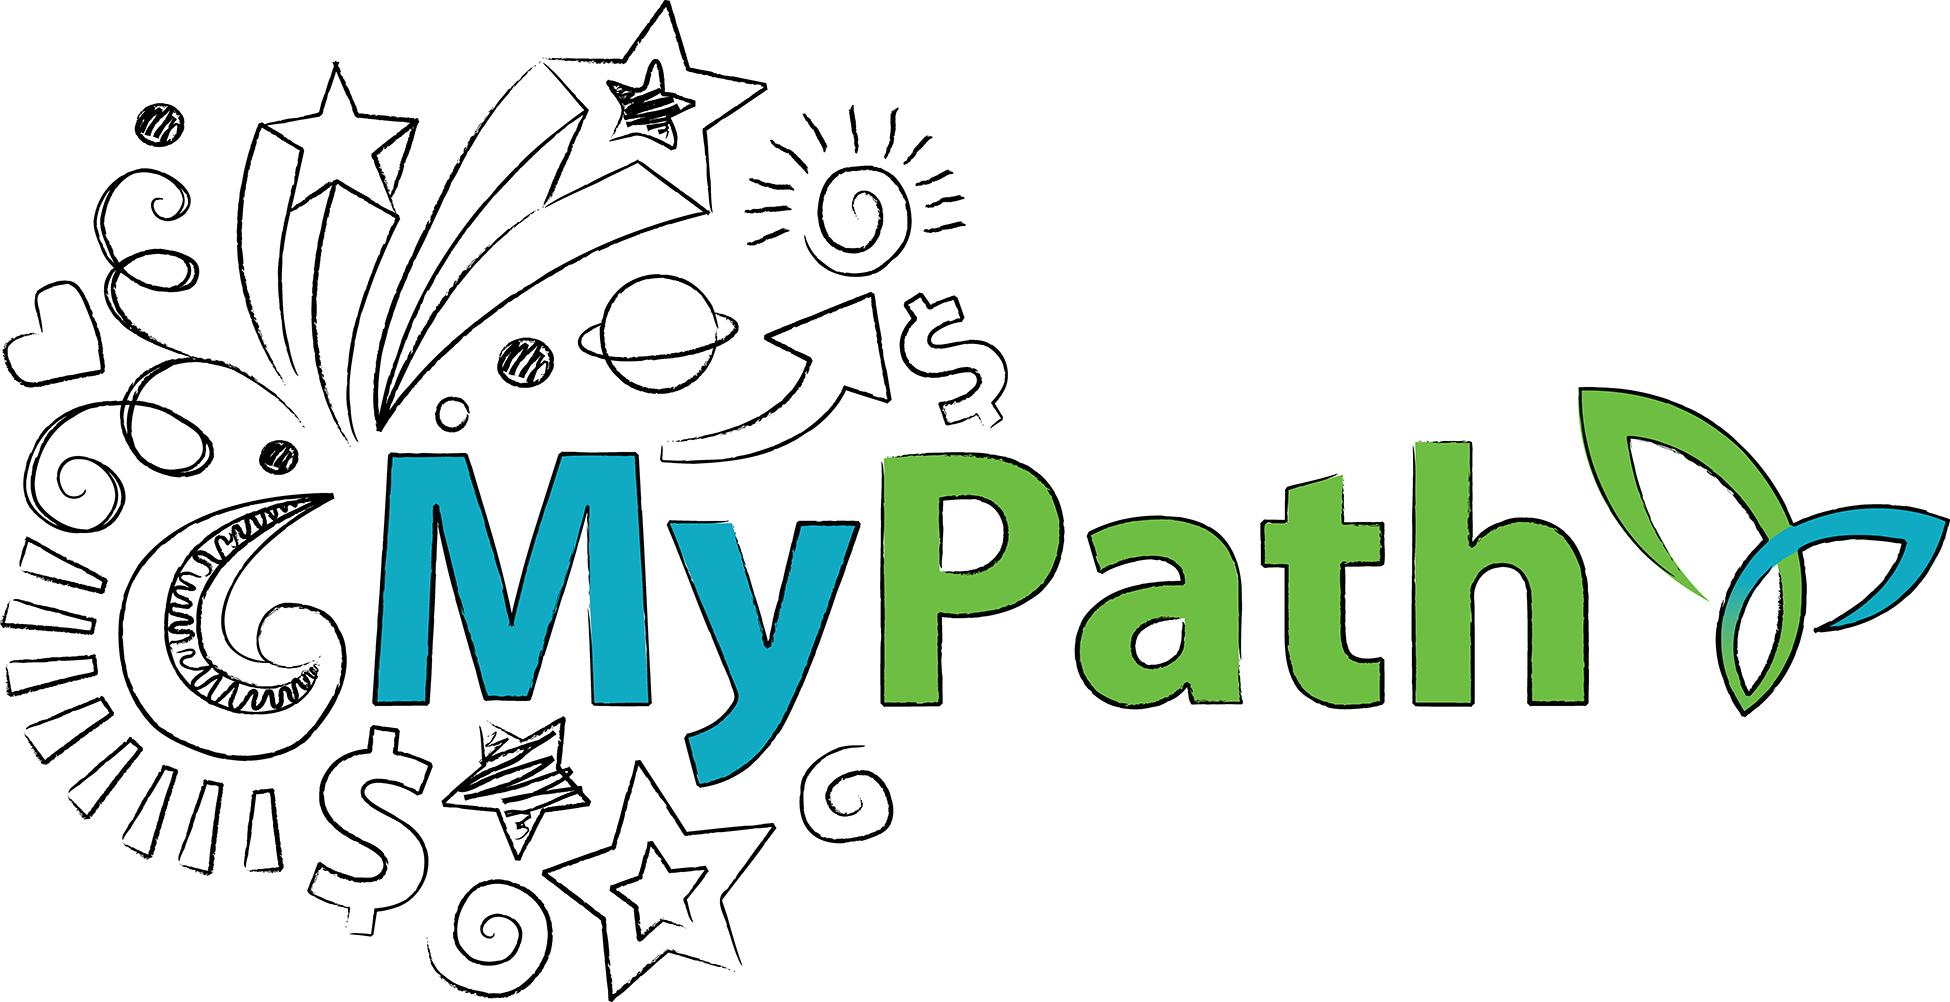 files-mypath-doodle-design